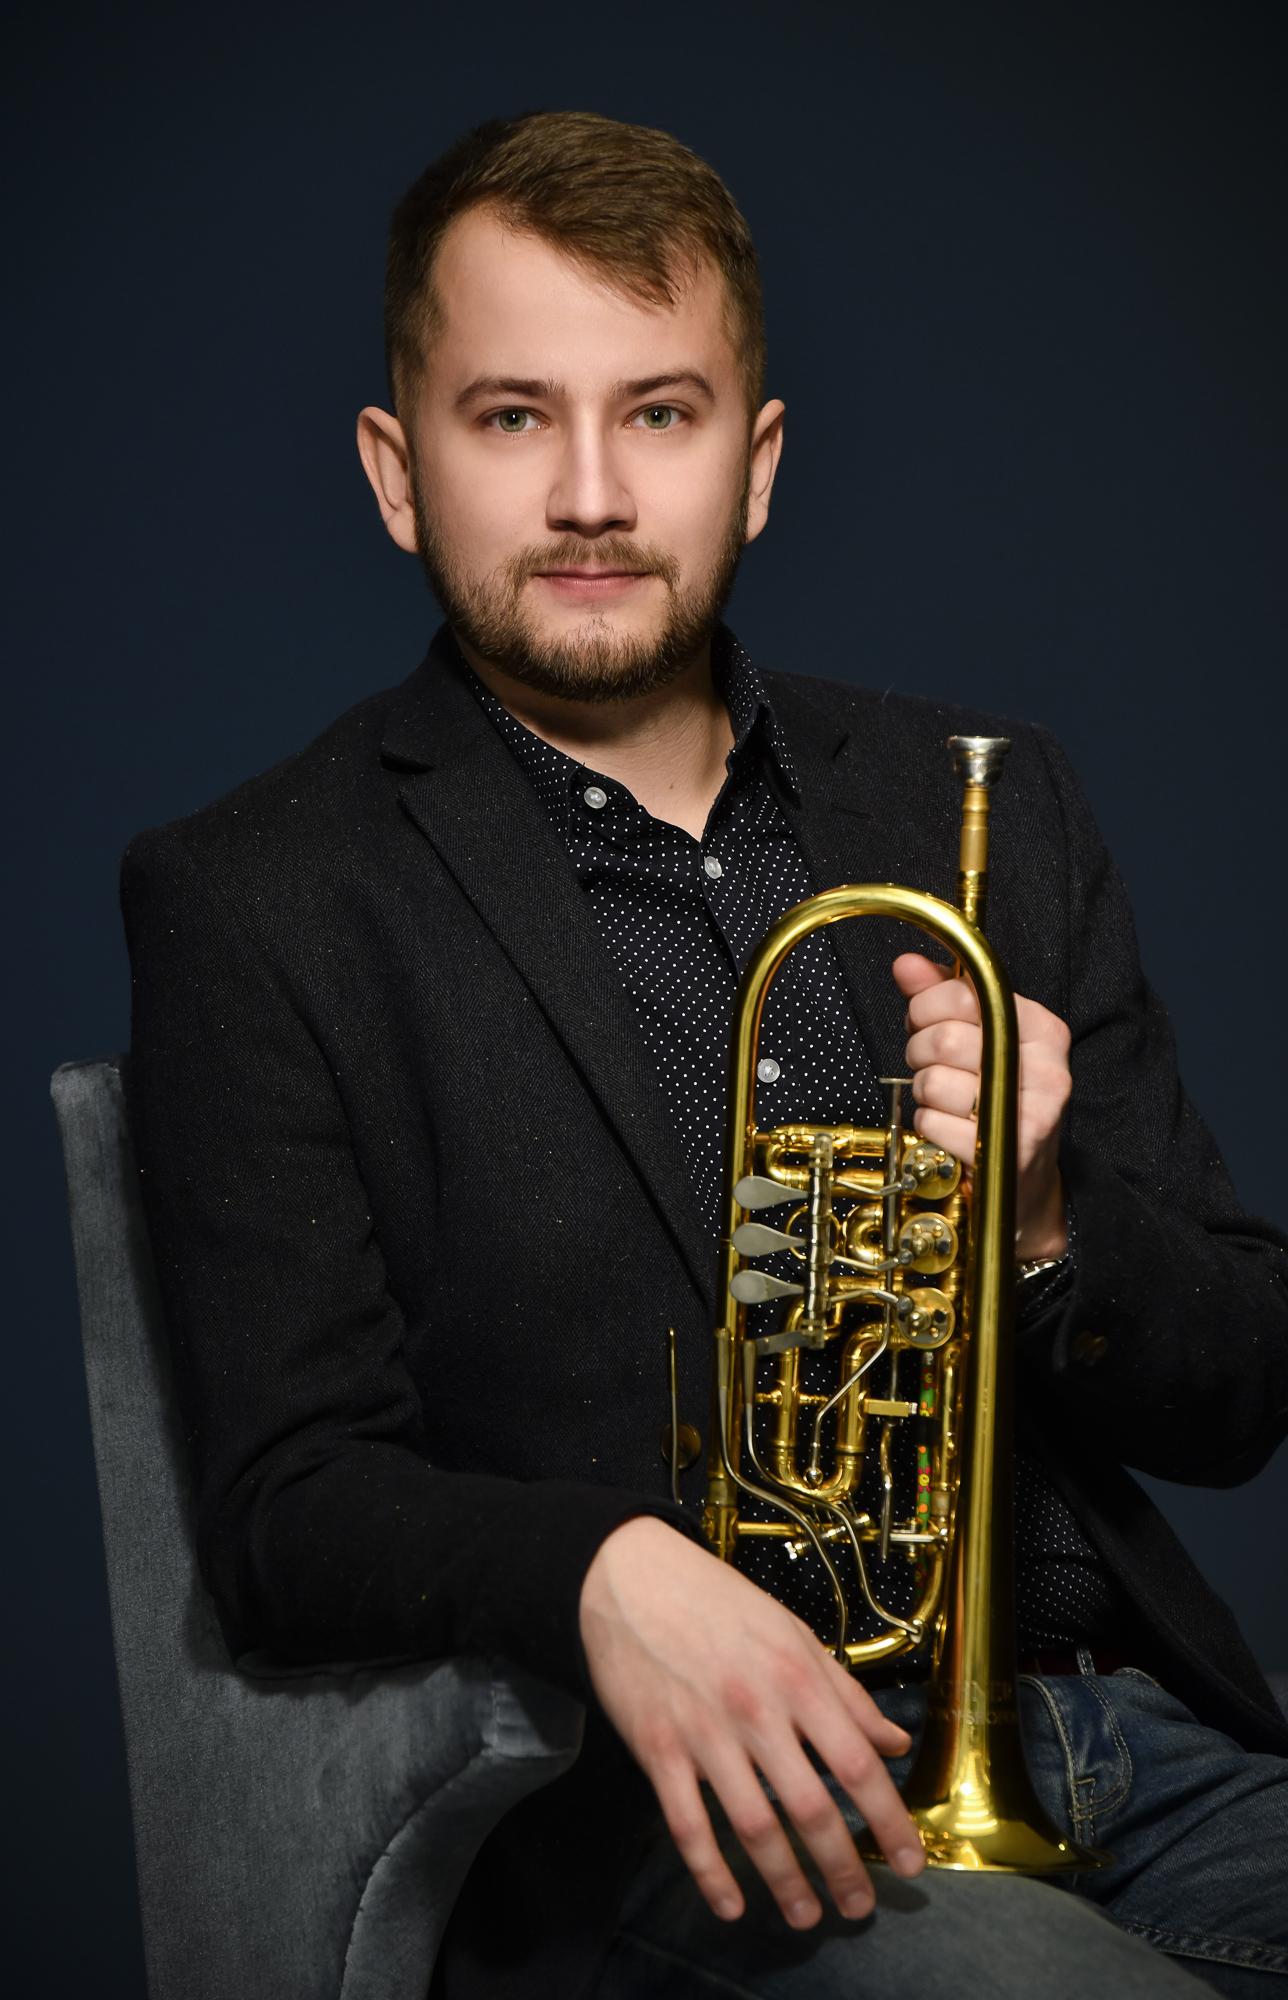 Jozef Zimka